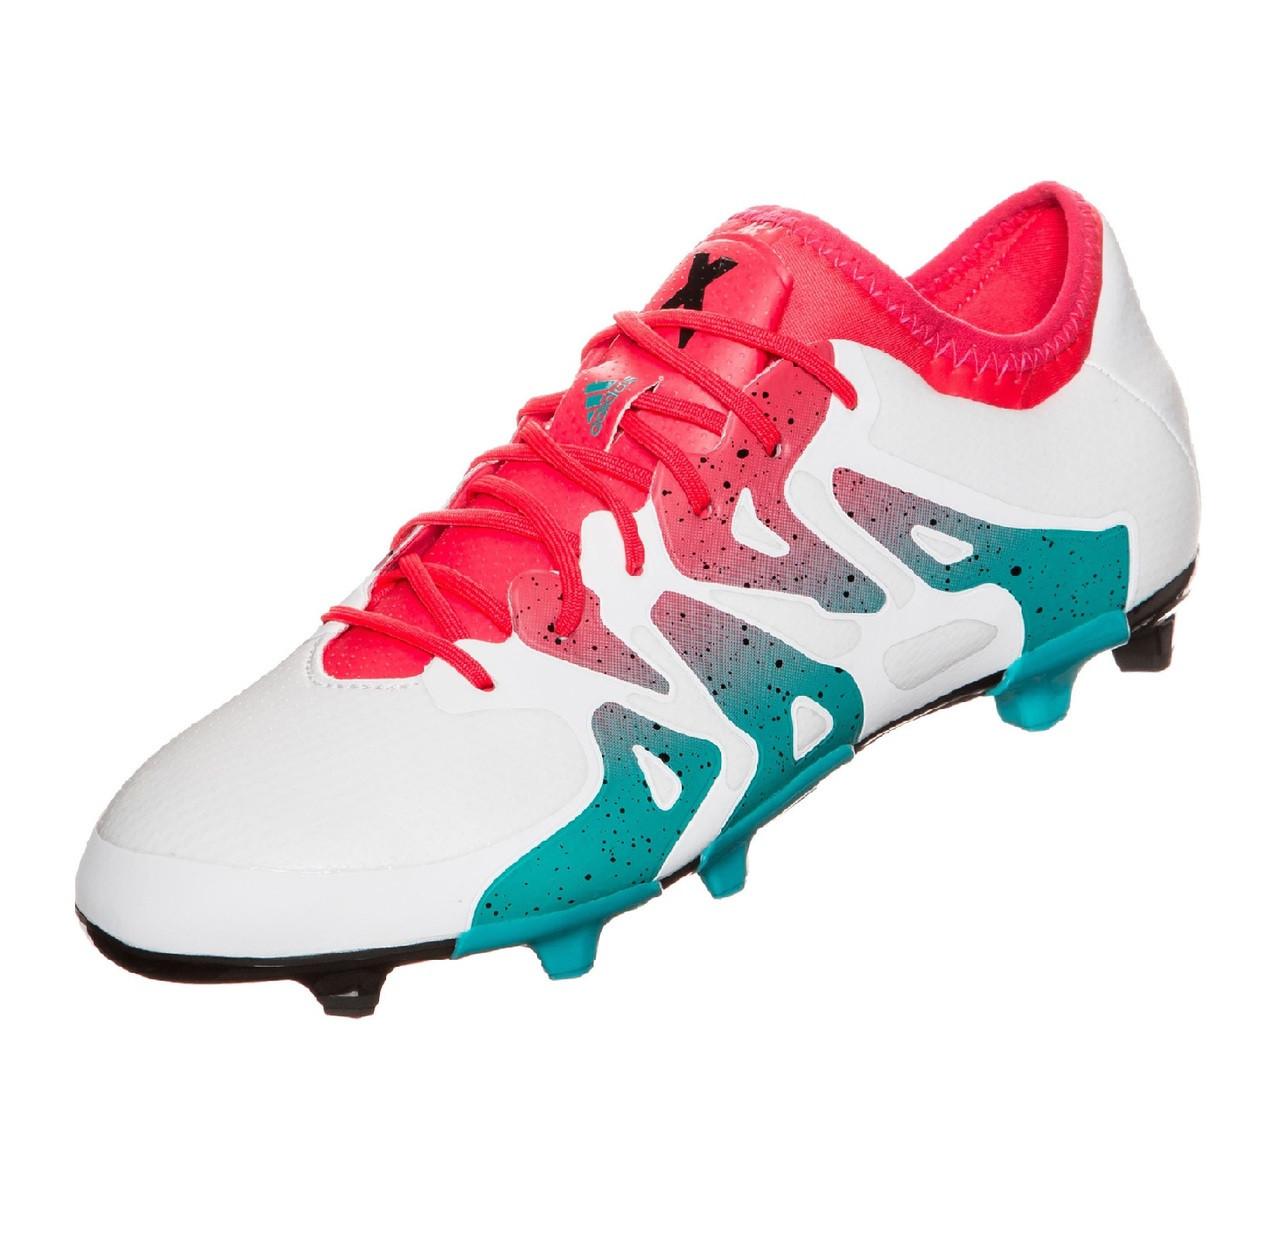 0de9a0297 adidas Womens X 15.1 FG AG RC - White Shock Green Core Black RC (020519) -  ohp soccer